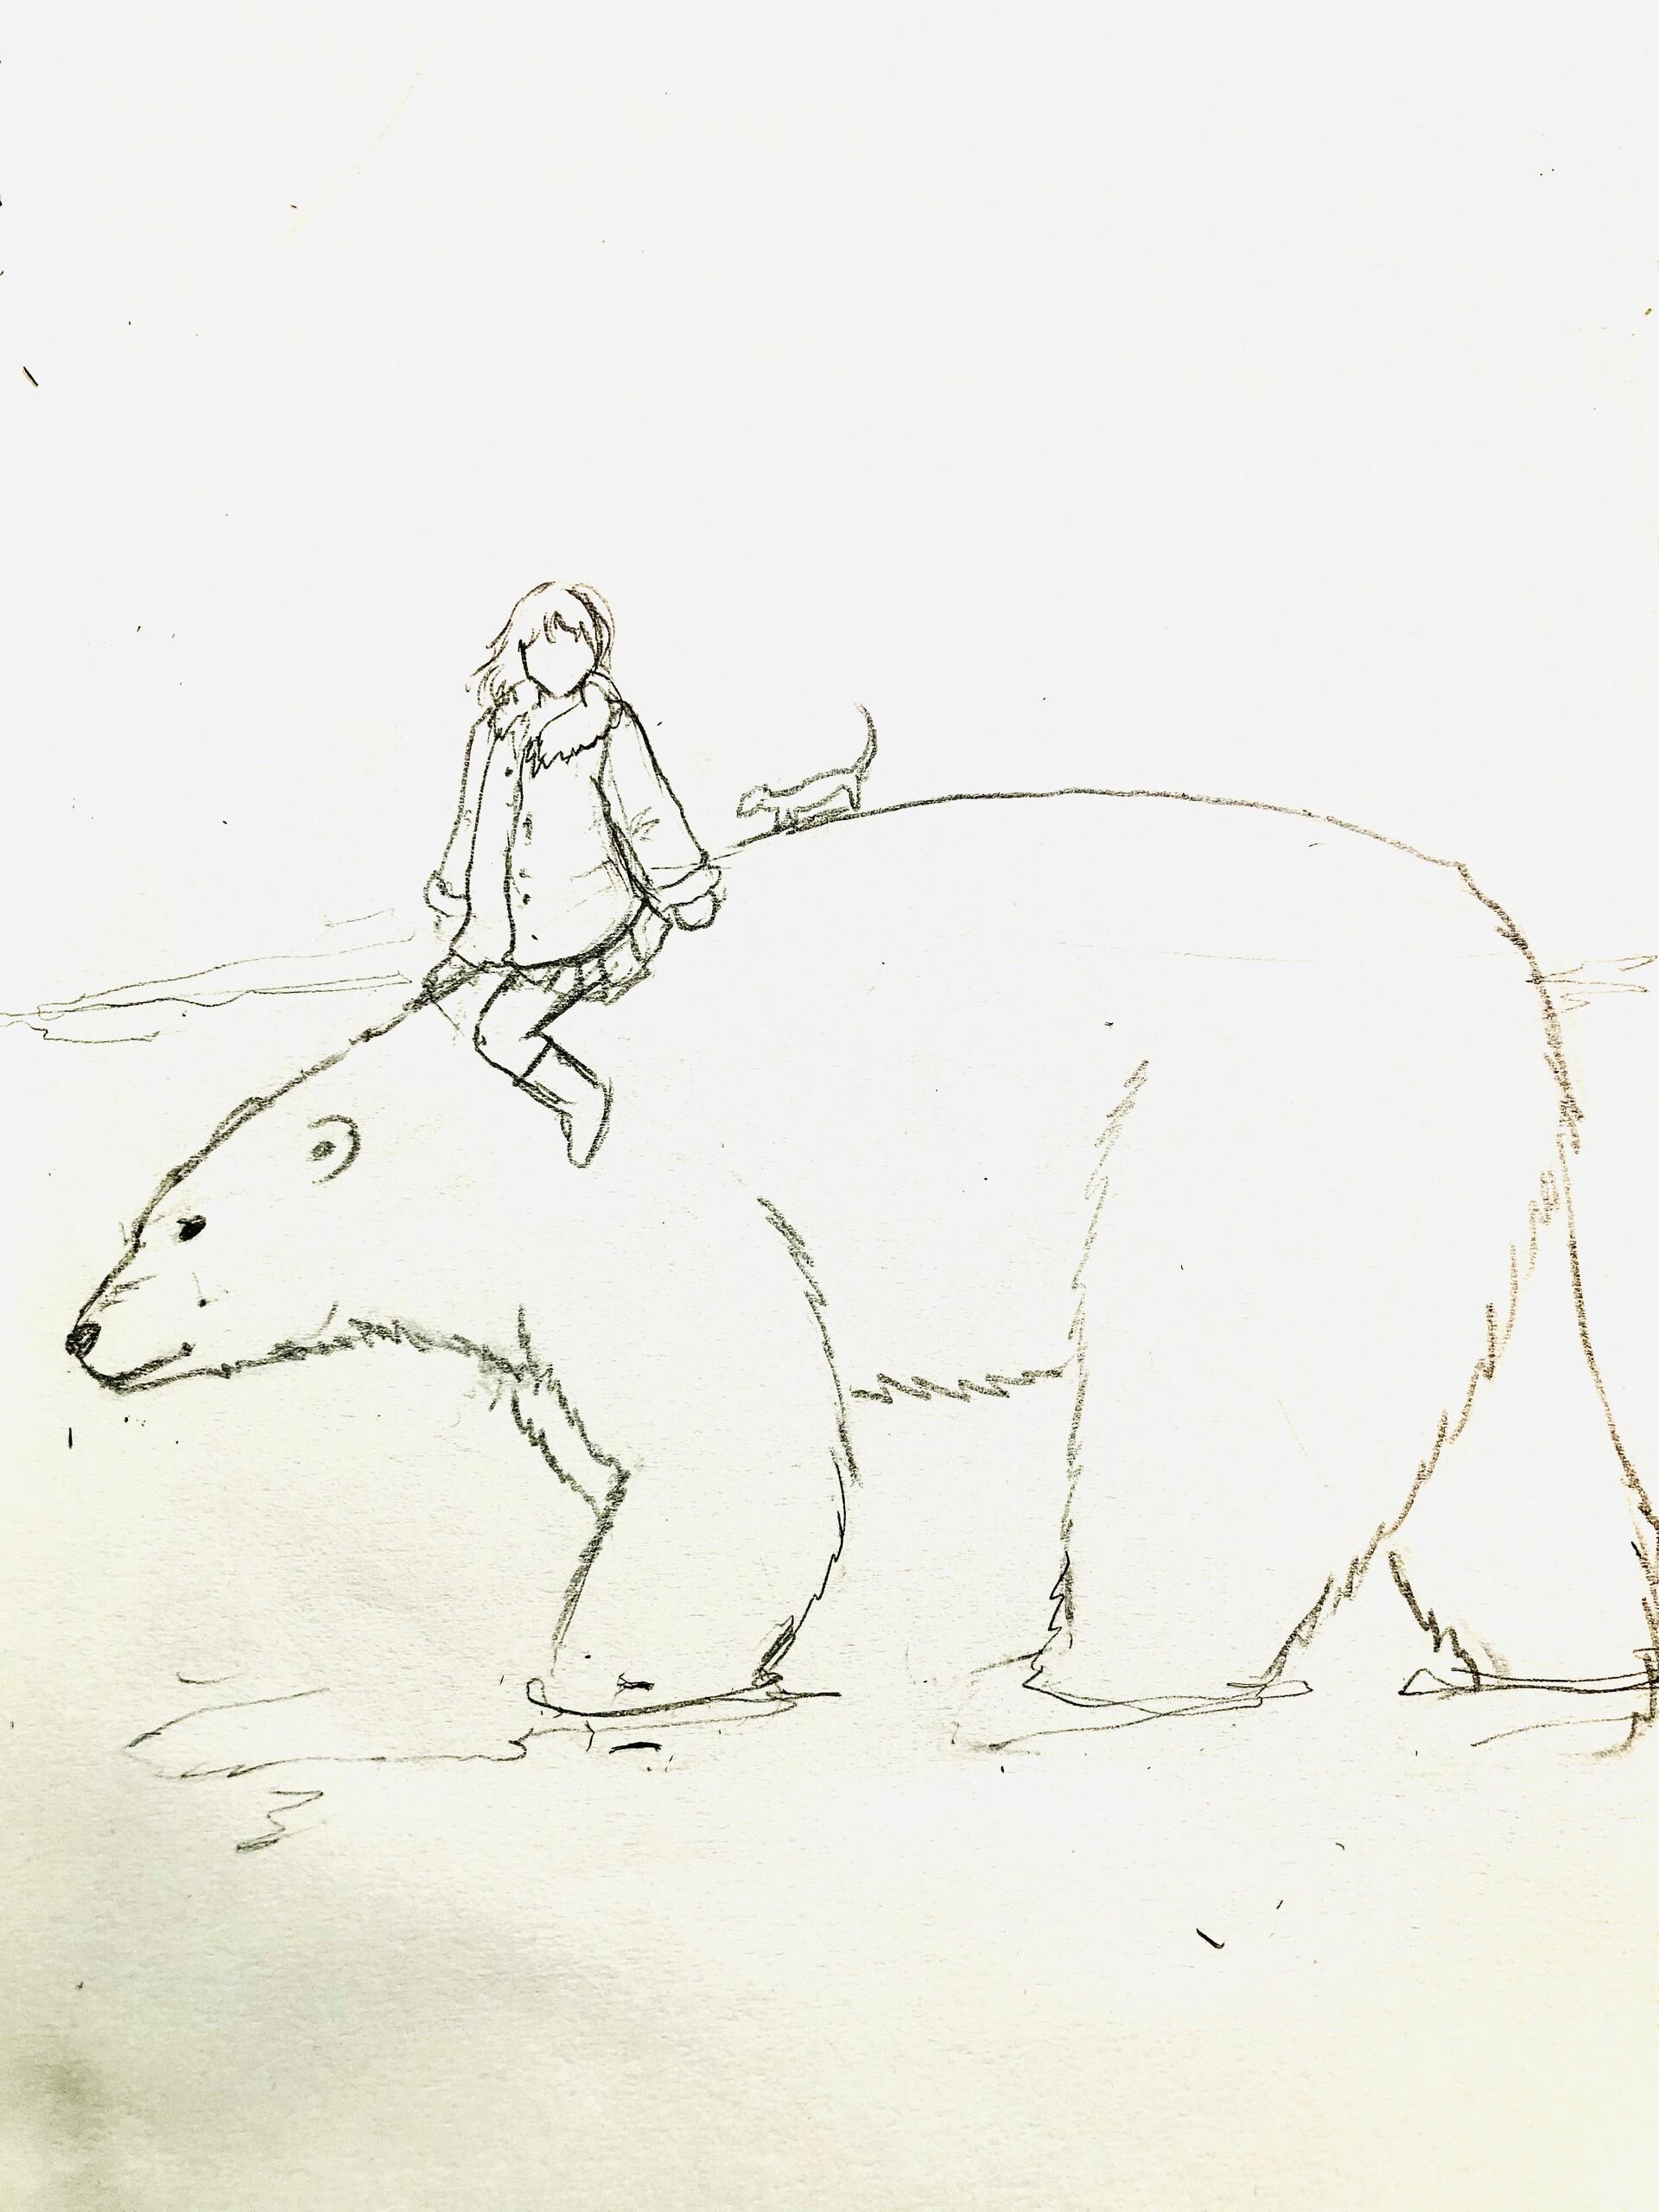 Pencil thumbnail sketch.